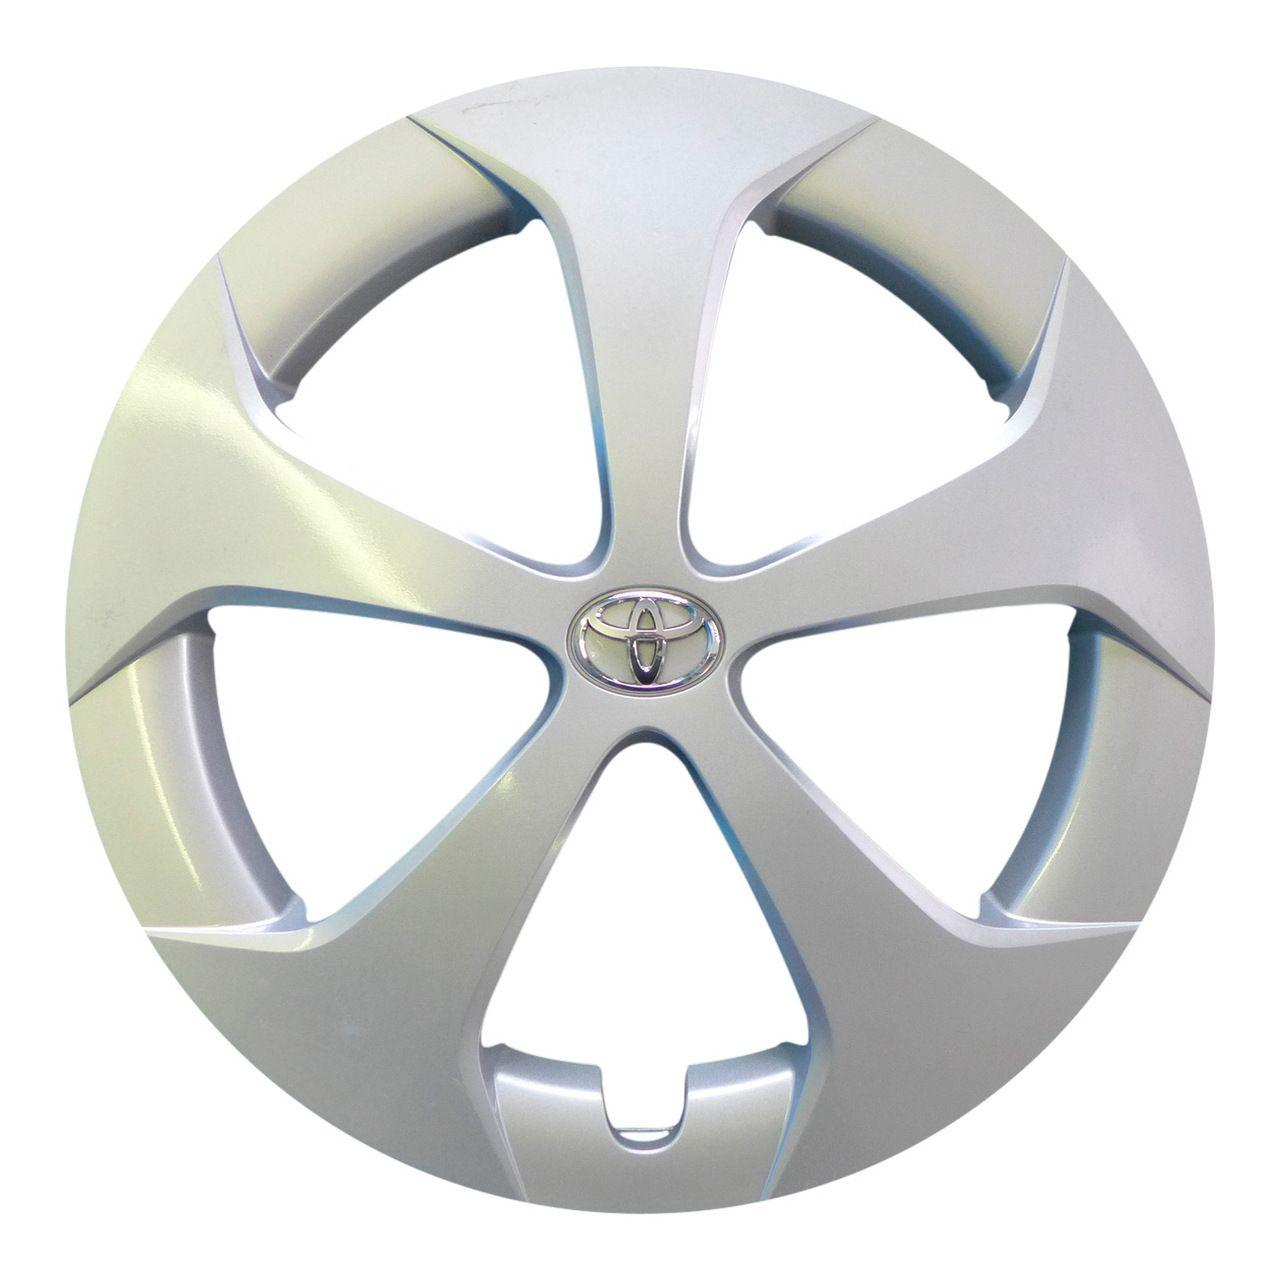 2012 2013 2014 2015 toyota prius hubcap wheel cover 15 61167